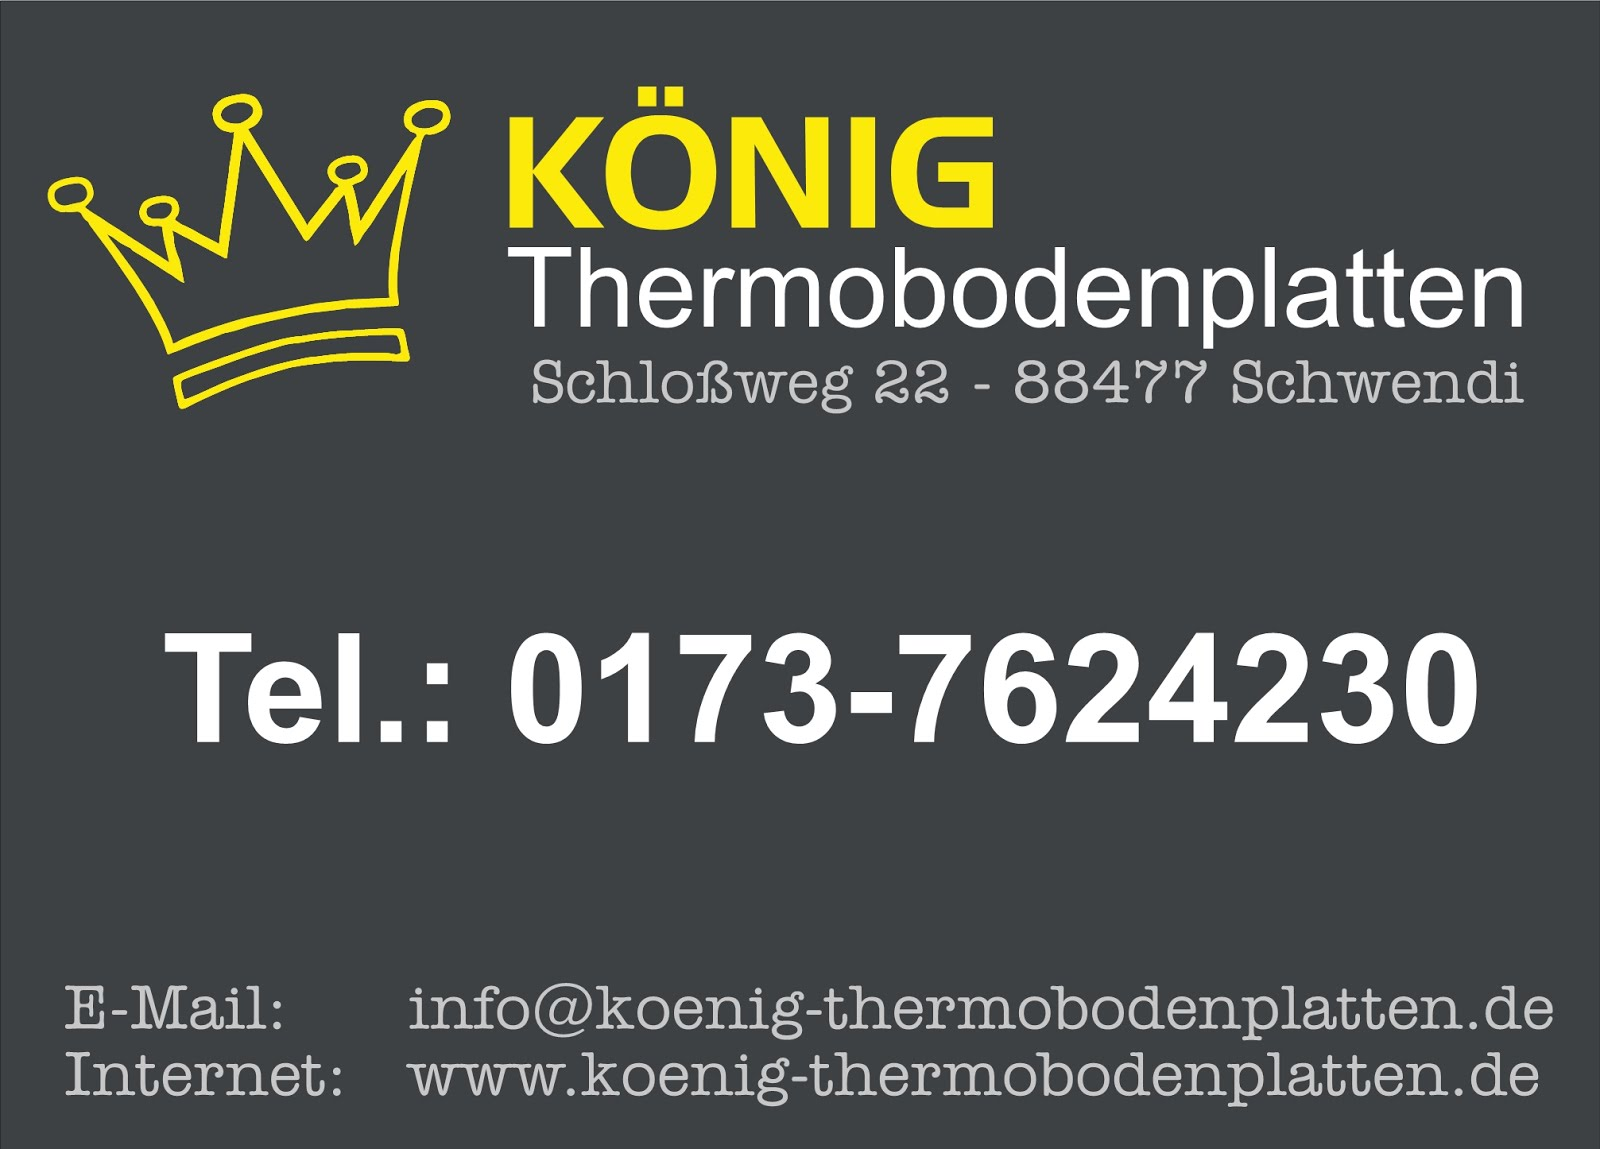 König - Thermobodenplatten